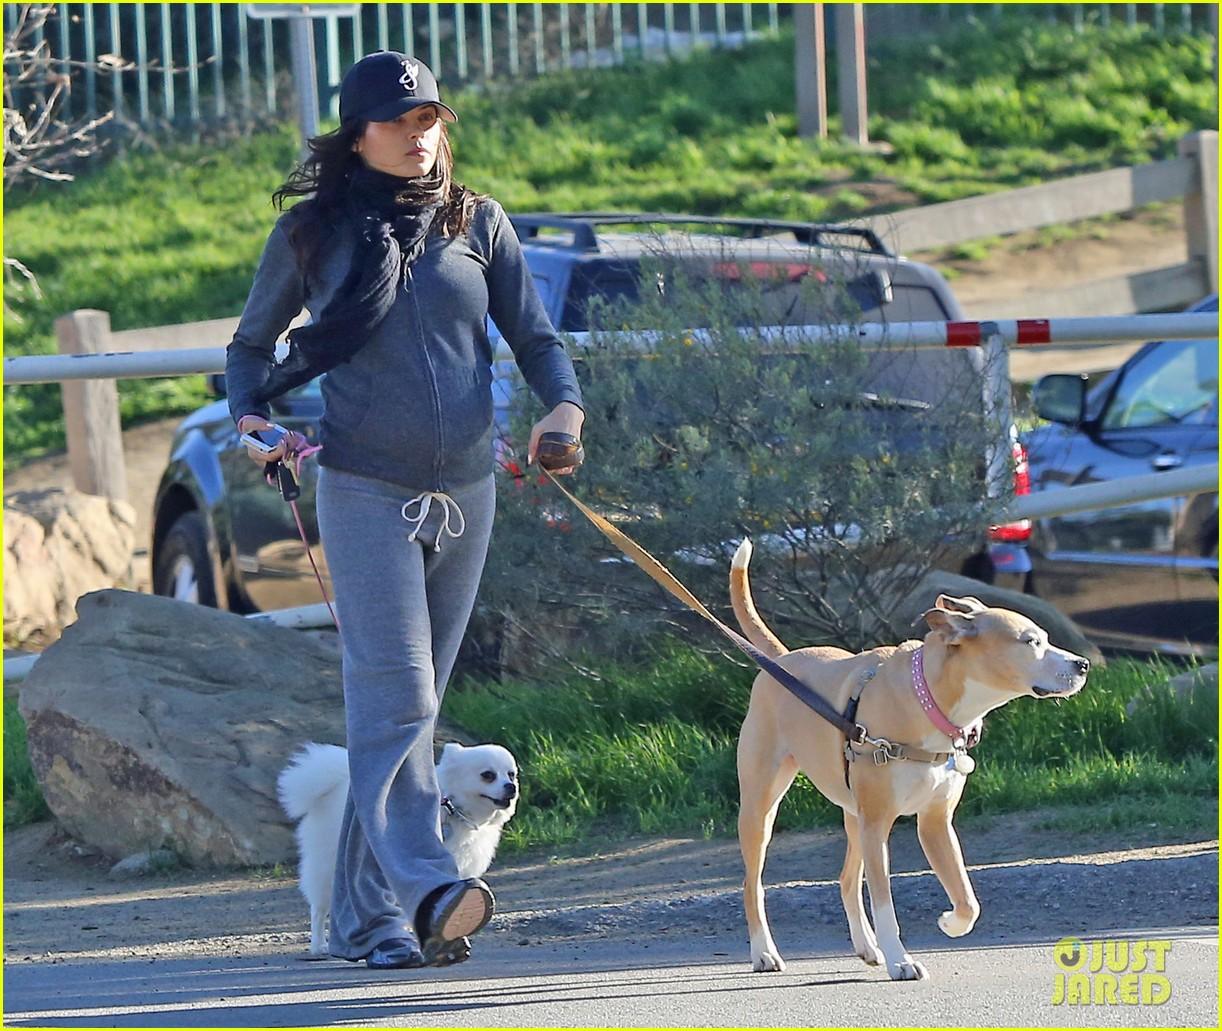 jenna dewan shows off growing baby bump on dog walk 06